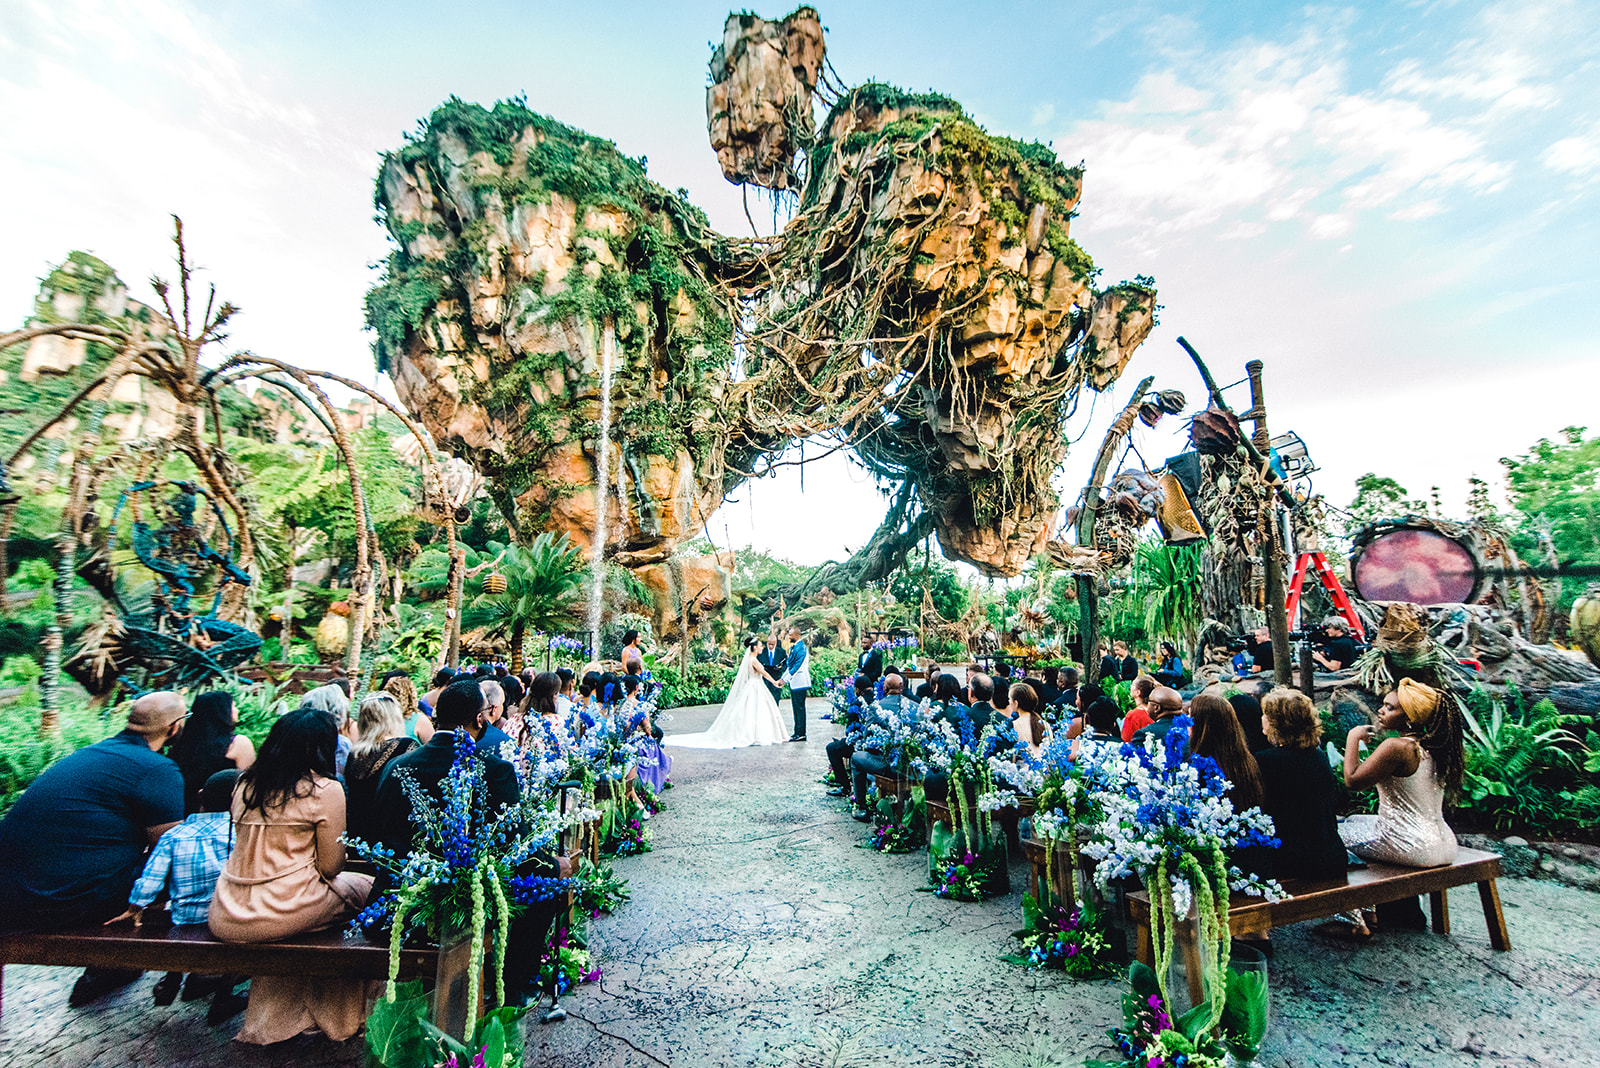 First Ever Fairytale Wedding in Disney's Pandora the World of Avatar